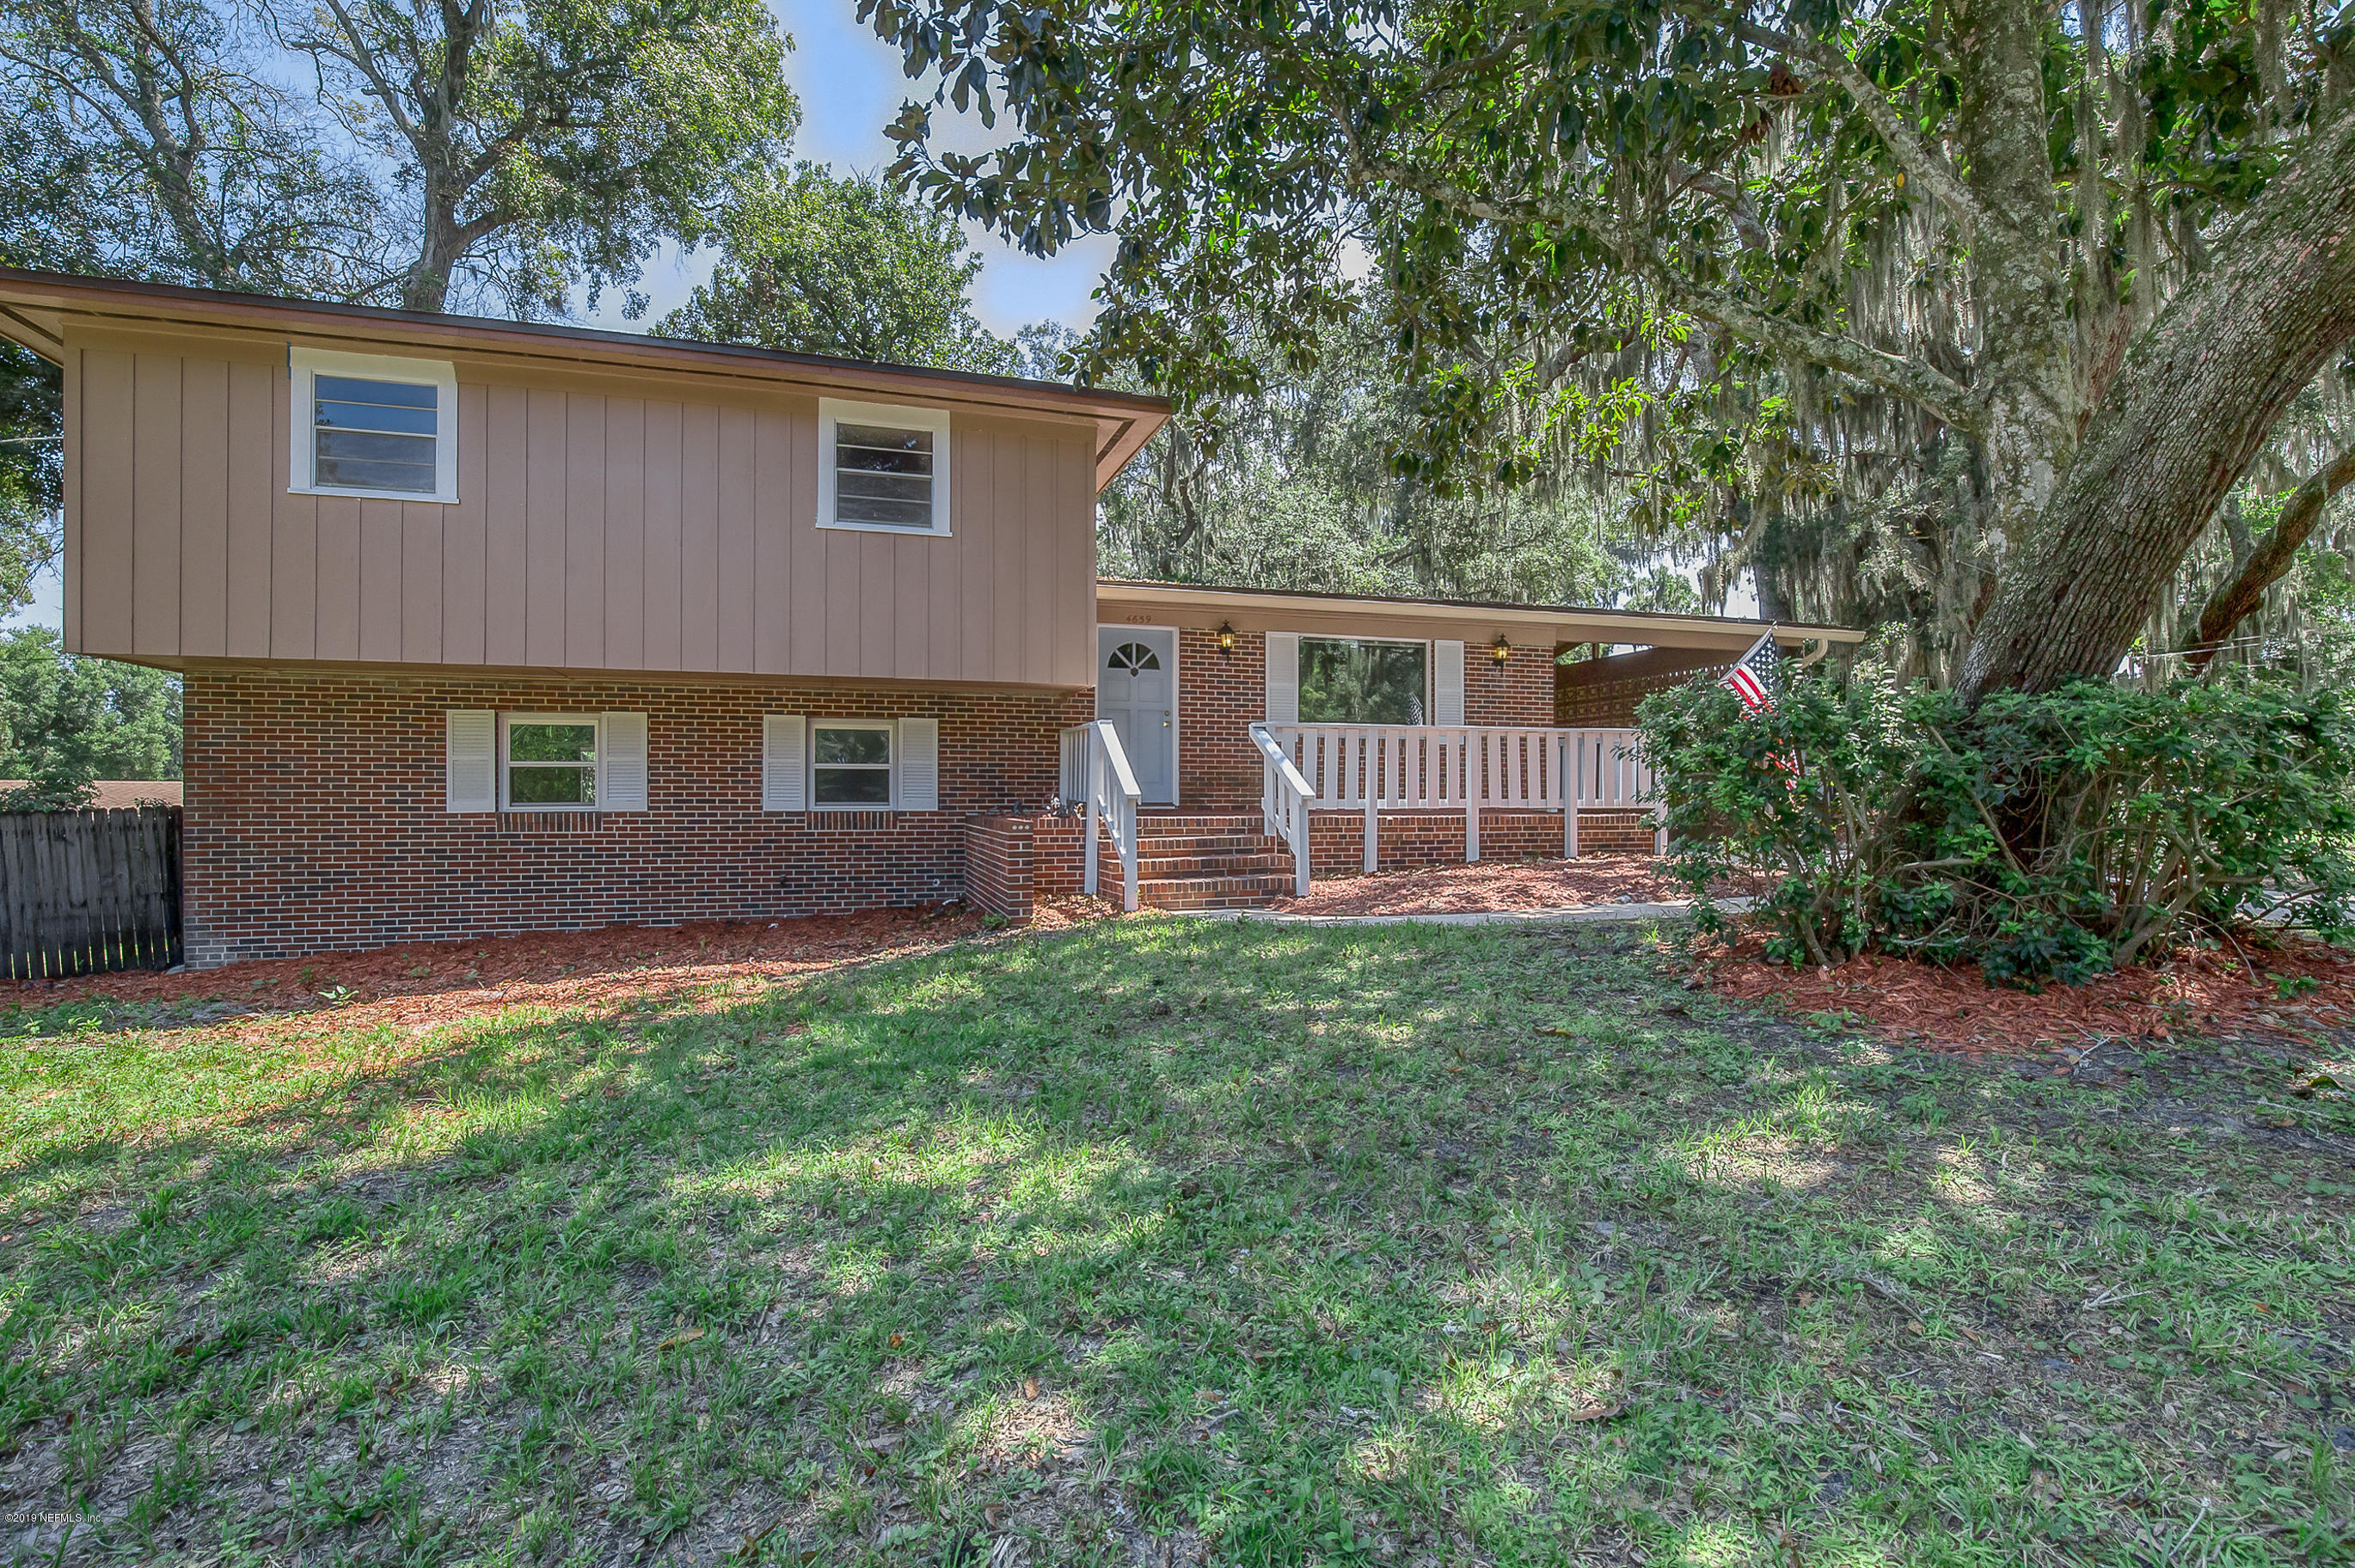 4659 BLUFF AVE, JACKSONVILLE, FLORIDA